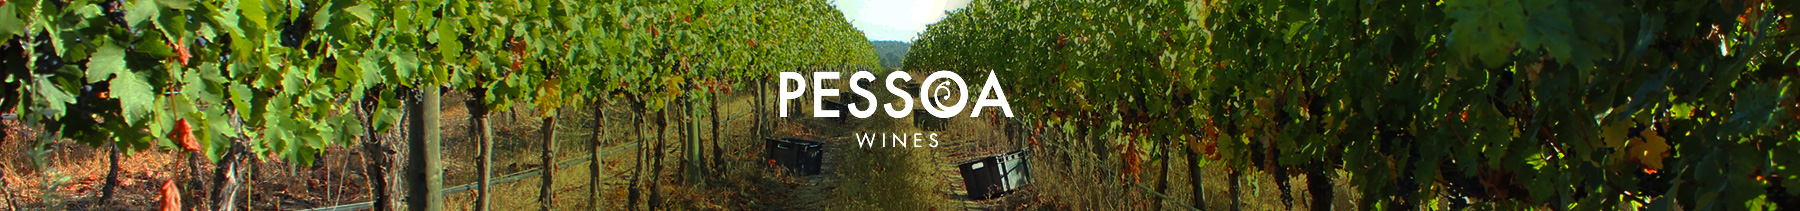 Pessoa Wines